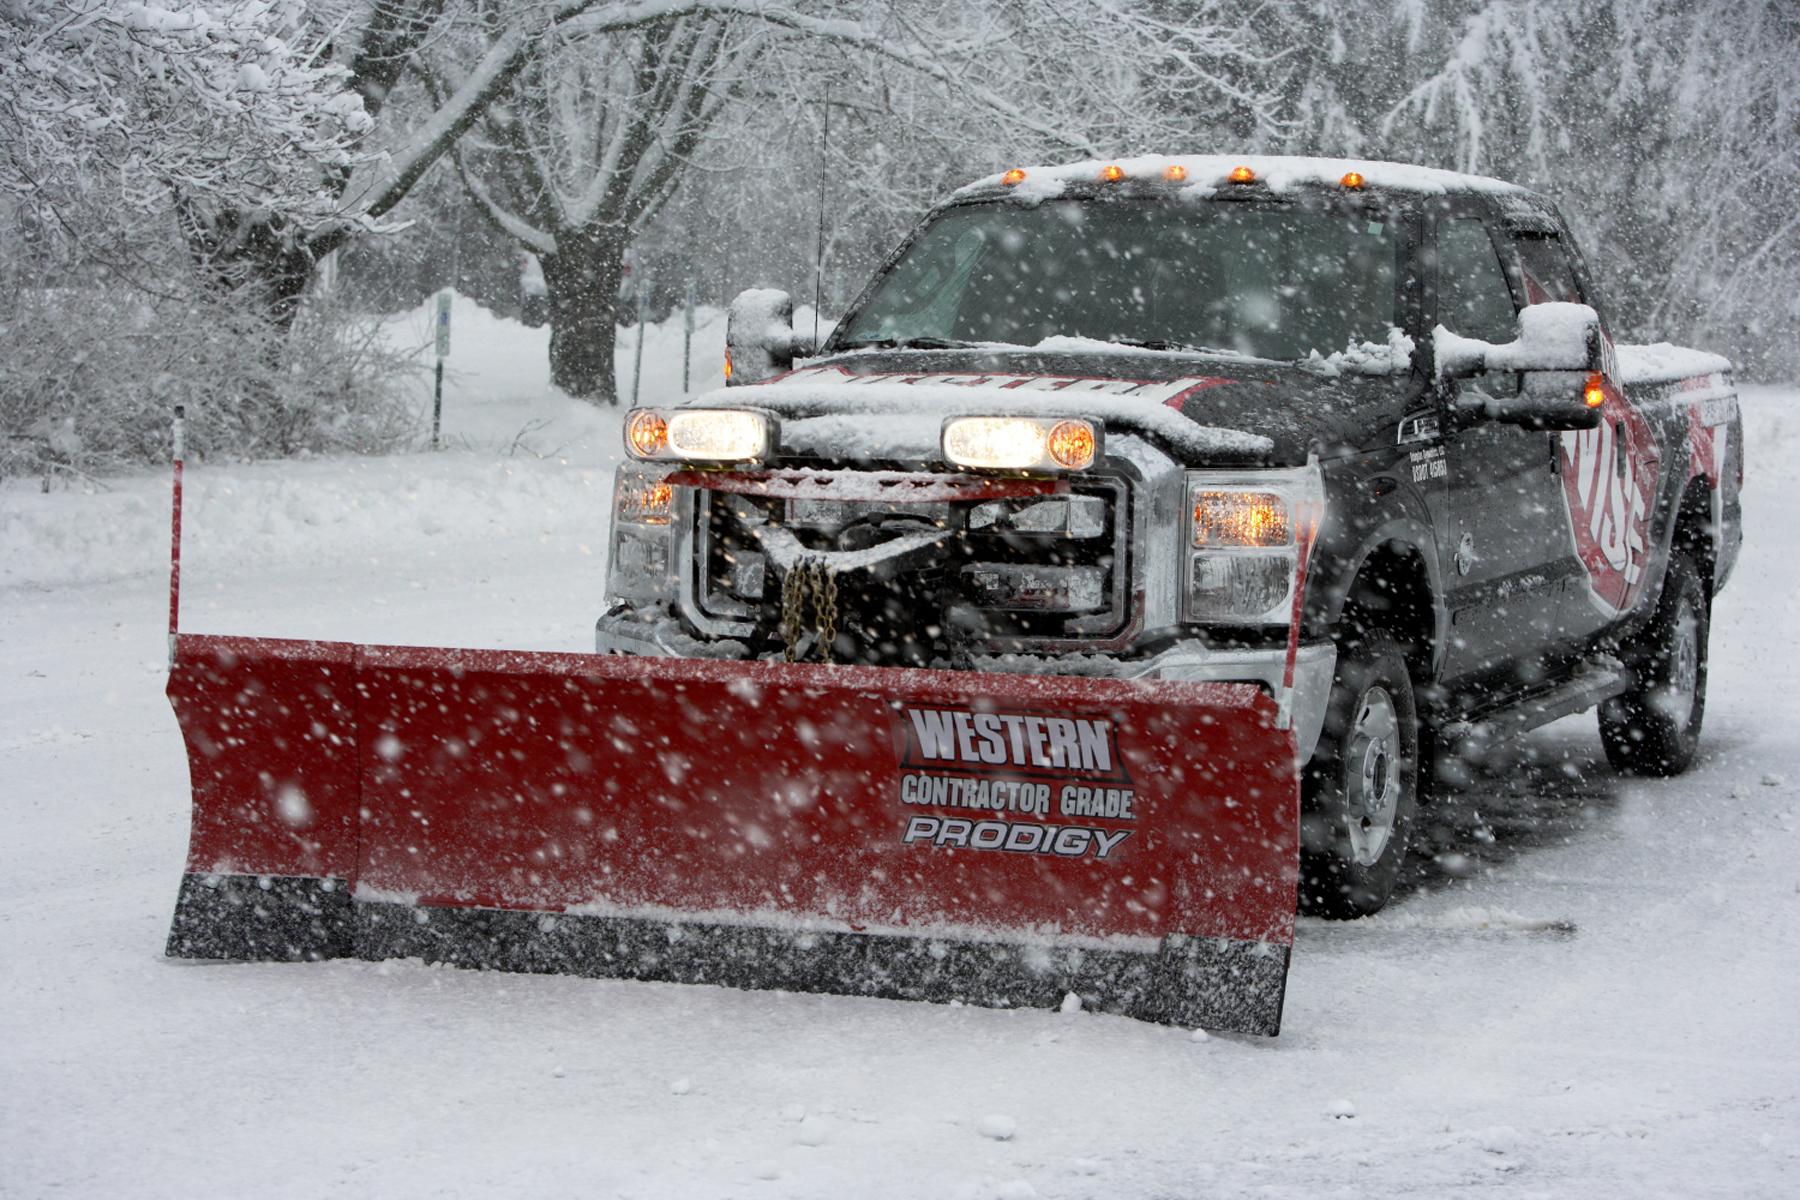 PRODIGY™ Multi-Position Wing Plow | NJ Snowplows | Western & Fisher Snowplows & Salt Spreaders